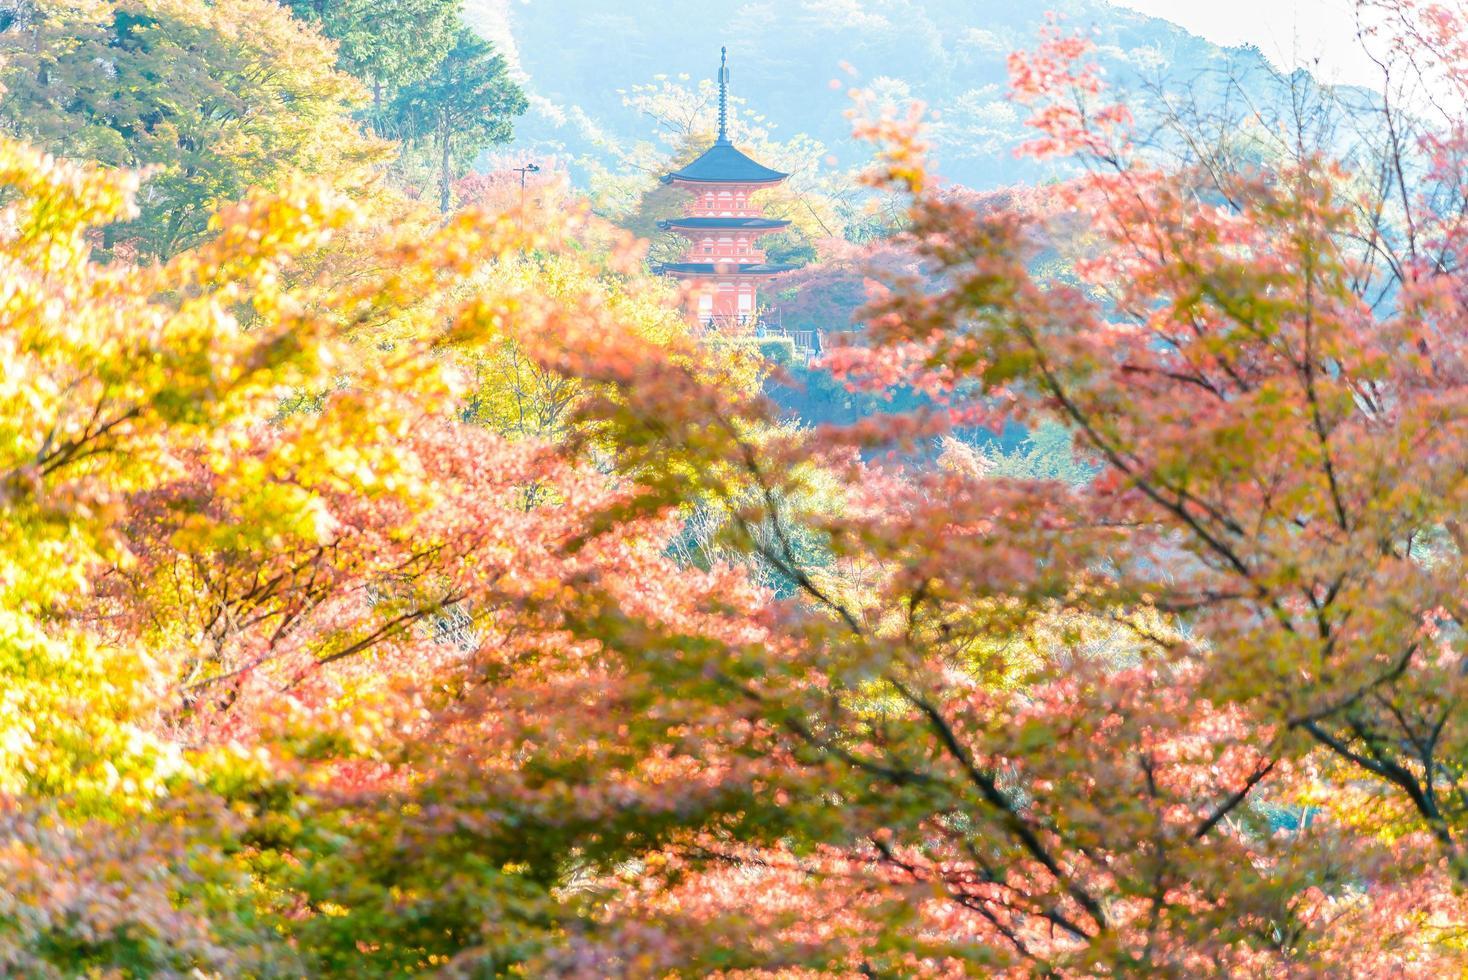 kiyomizu dera-tempel in kyoto, japan foto